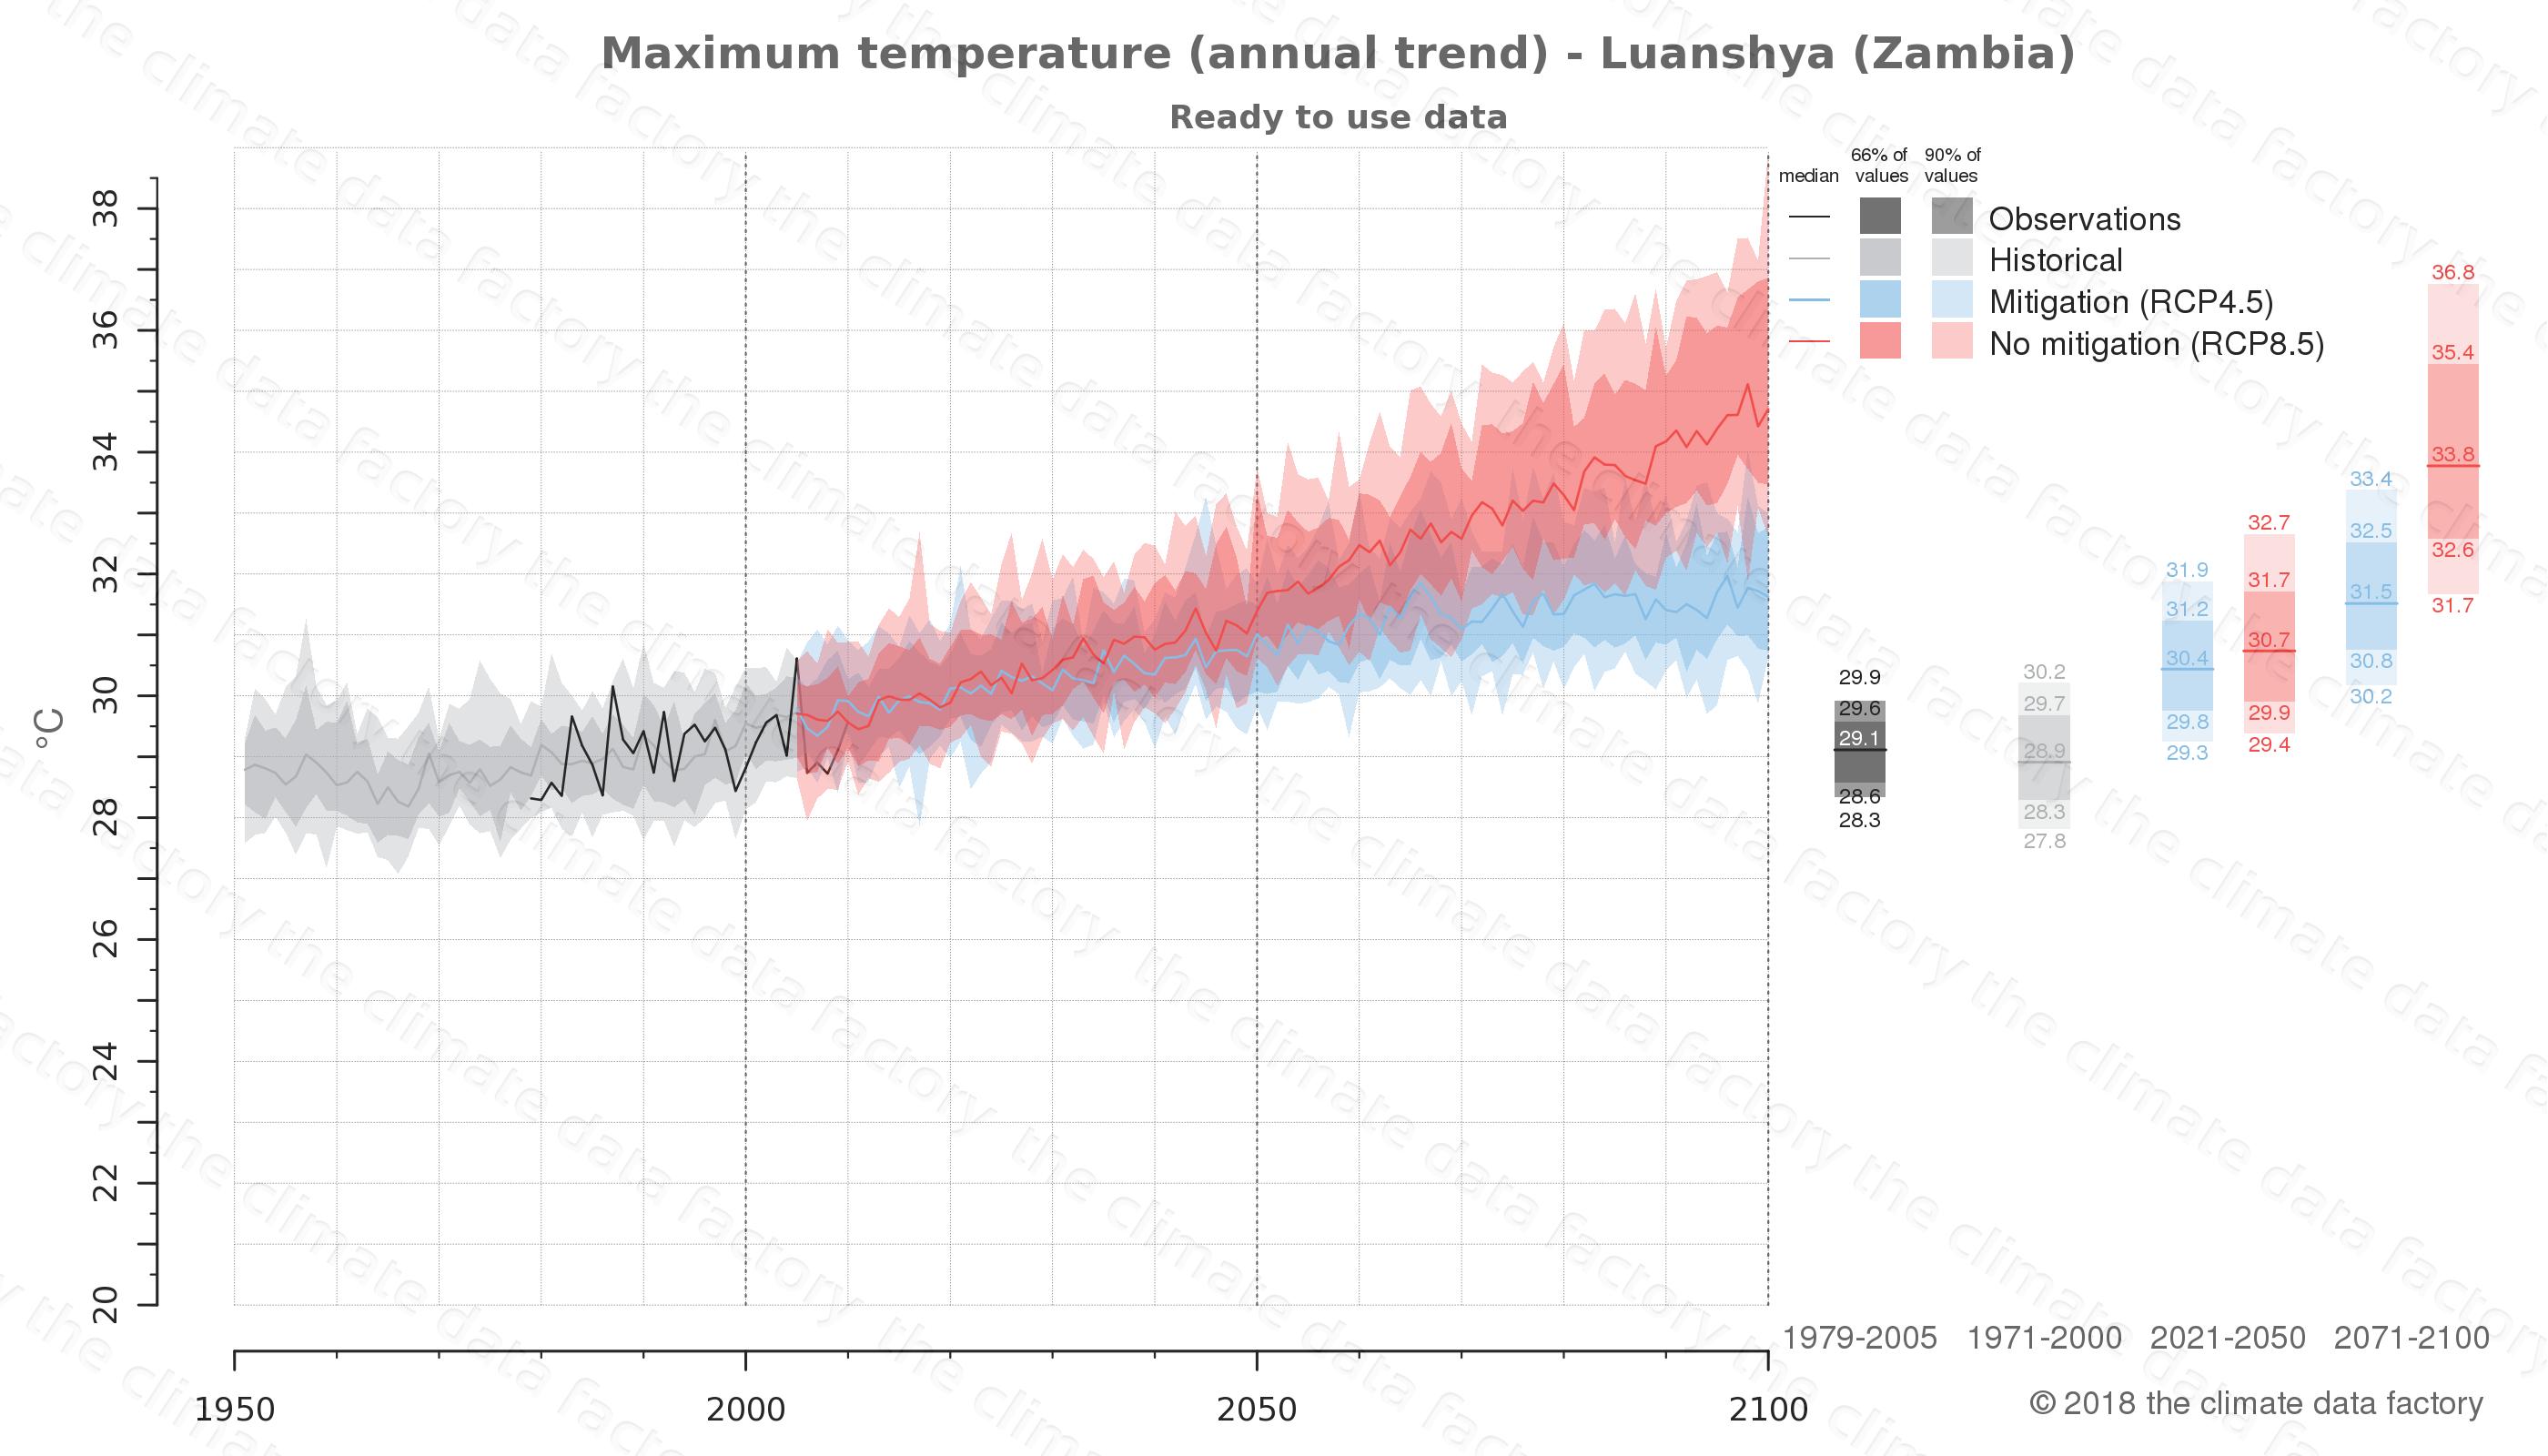 climate change data policy adaptation climate graph city data maximum-temperature luanshya zambia